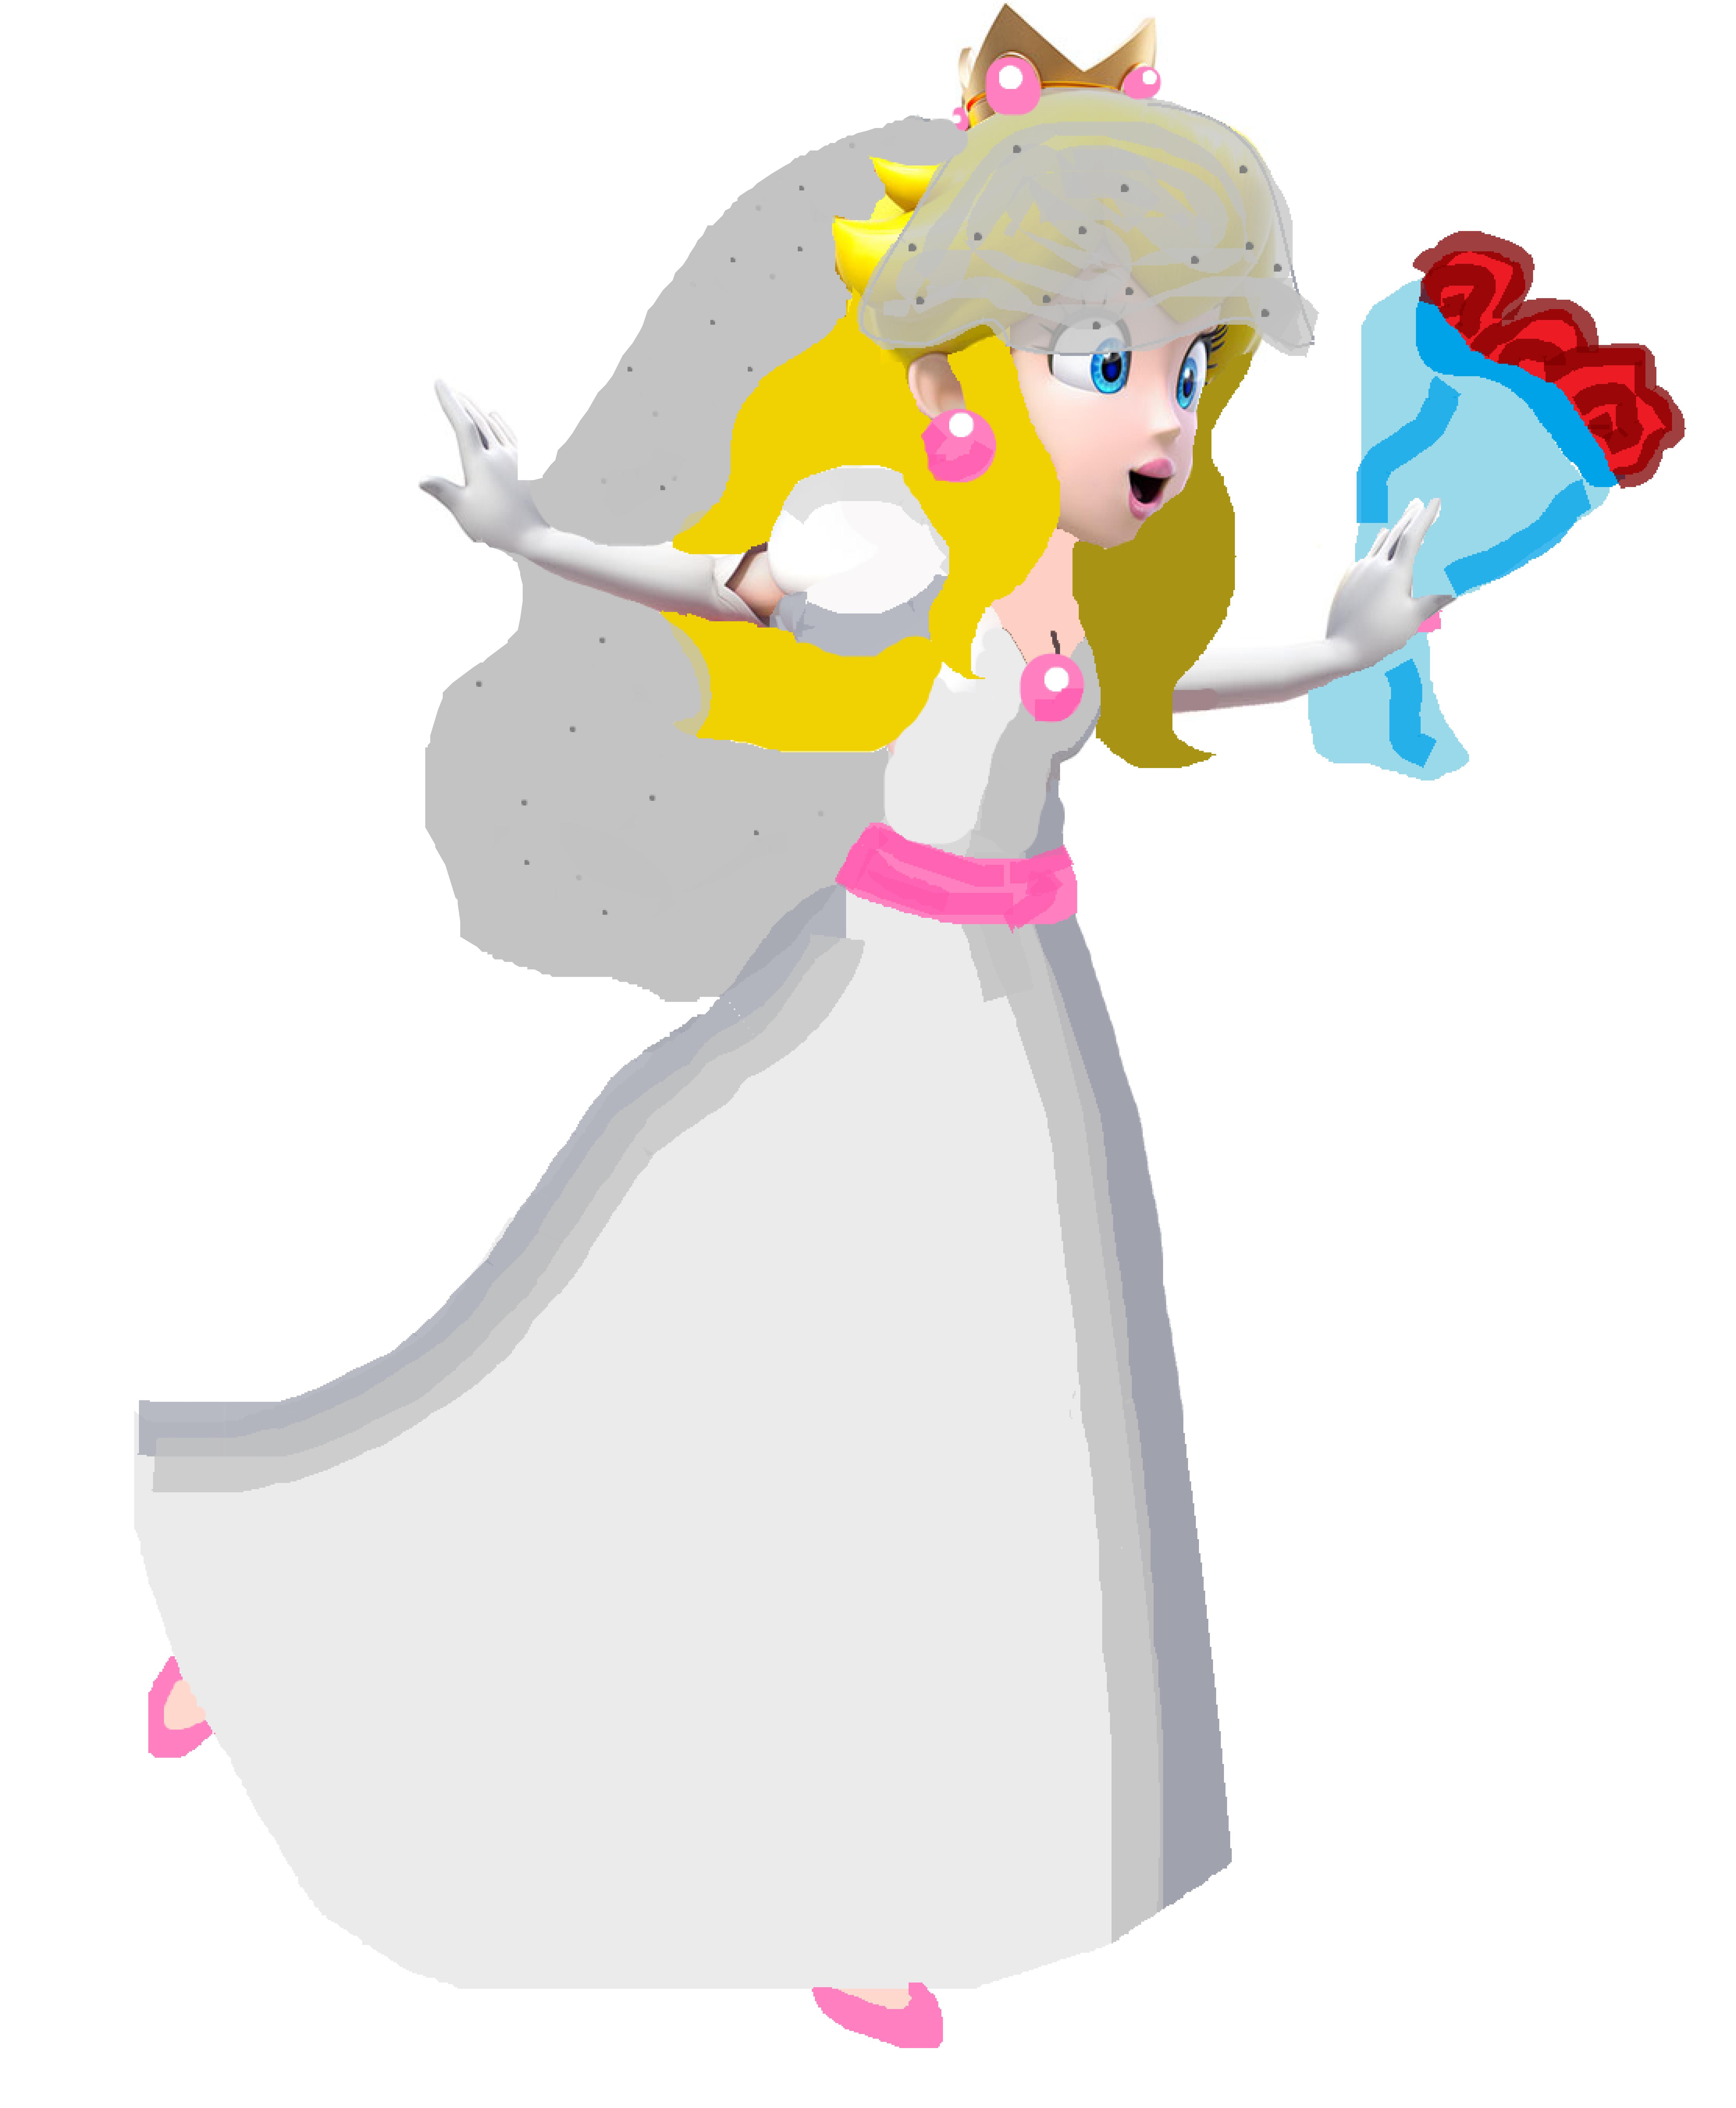 Image - Princess Peach wedding dress.png | Fantendo - Nintendo Fanon ...